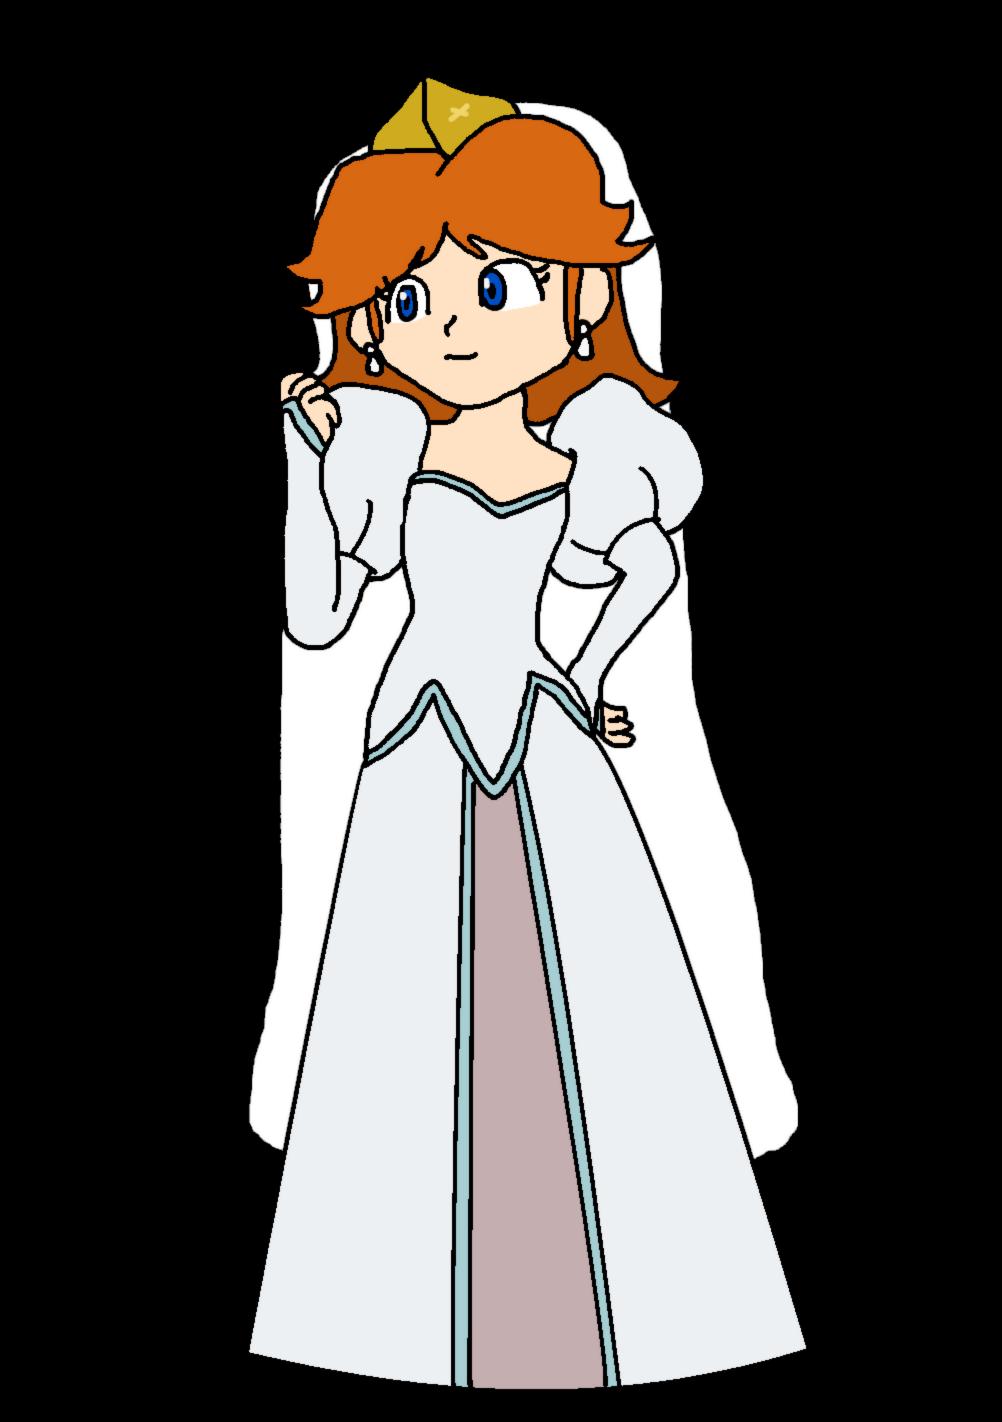 Daisy - Ariel (Wedding Dress) by KatLime on DeviantArt